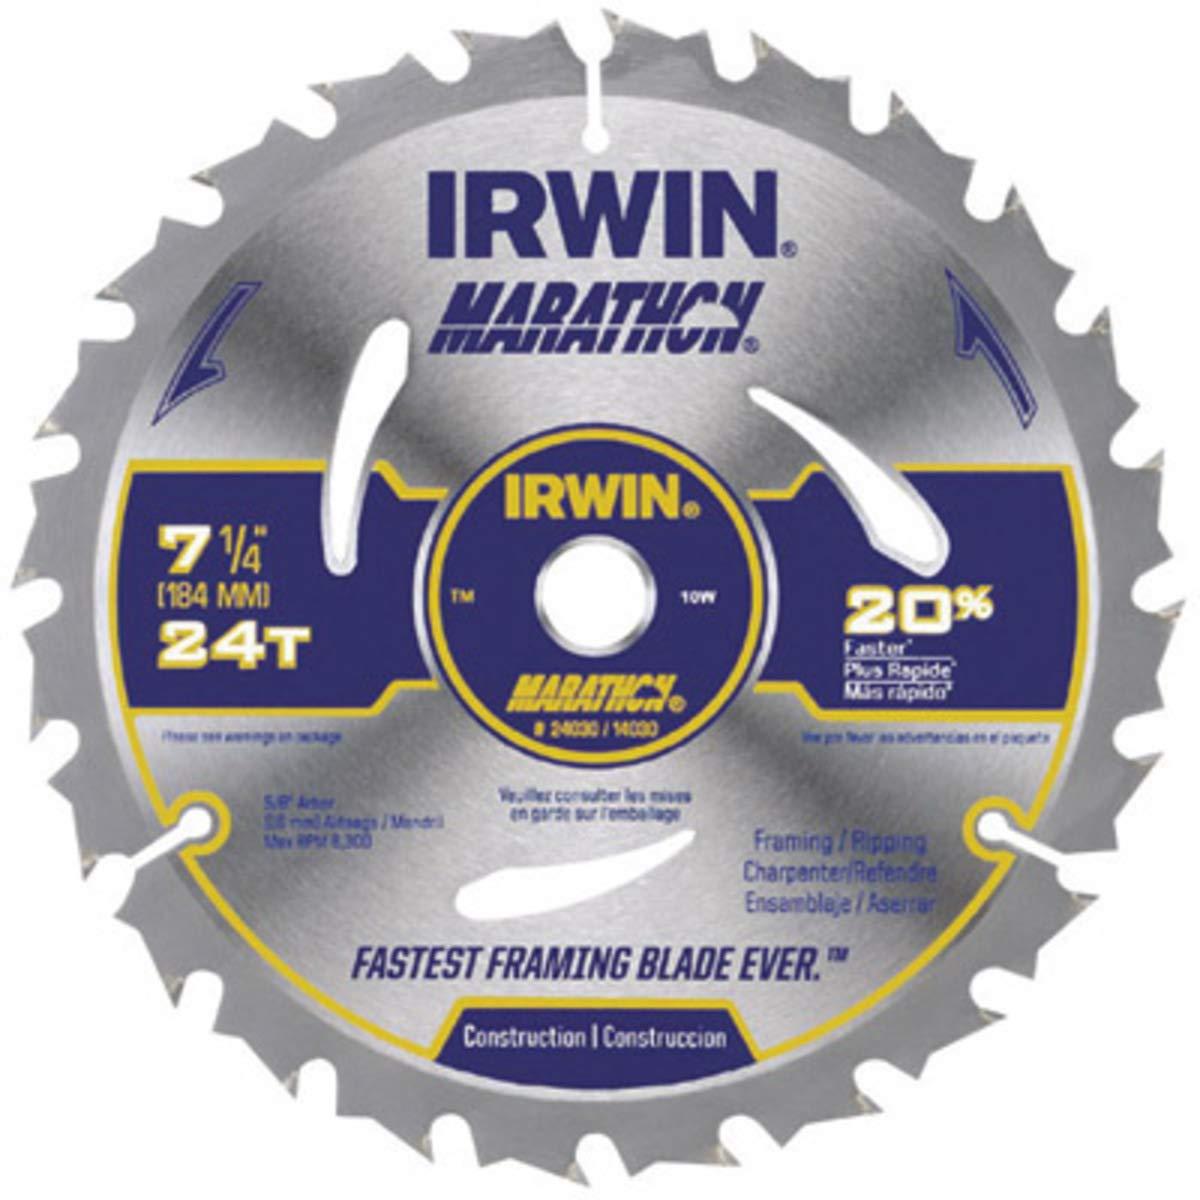 IRWIN 7 1/4'' X 5/8'' Diamond X .047'' 8300 RPM 24 Teeth ATB Grind Vise,Grip Marathon Carbide Tipped Portable Corded Circular Saw Blade (For Wood Cutting) (Carded),5 Each